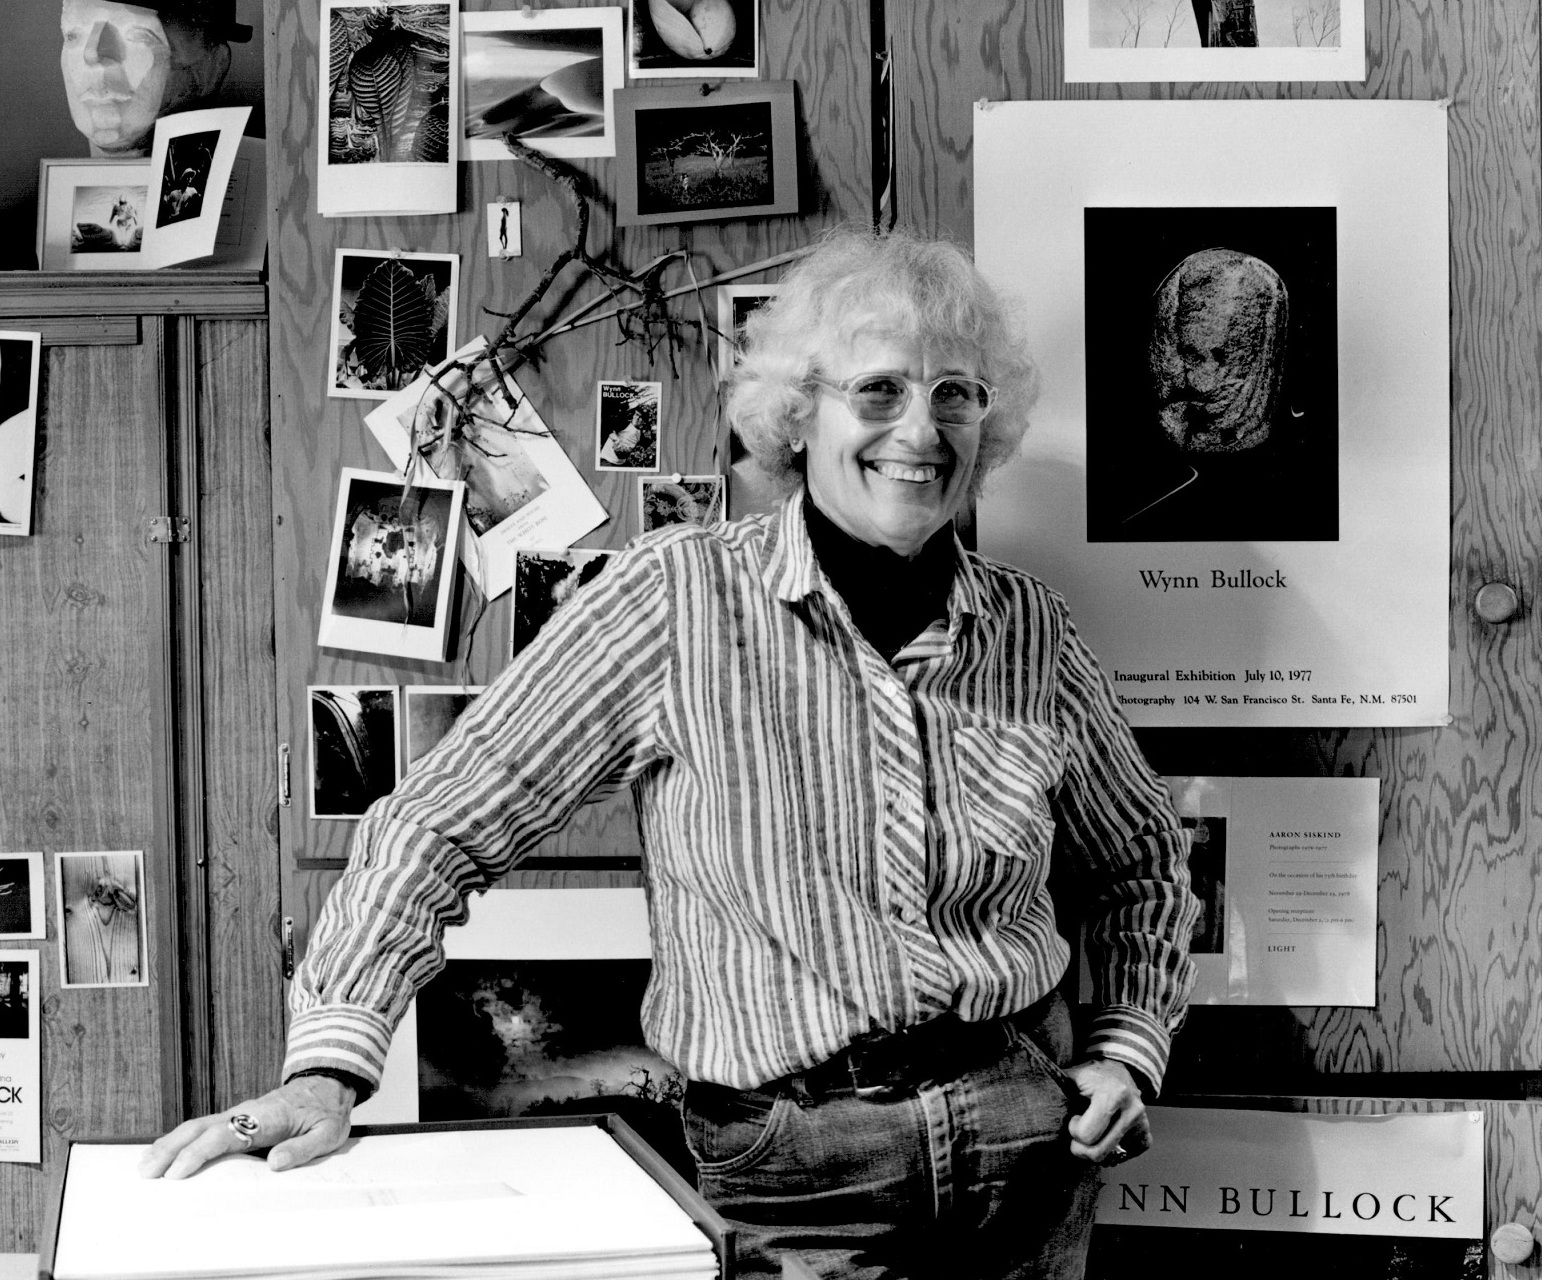 Edna in Home Studio by Kurt Fishback, 1980